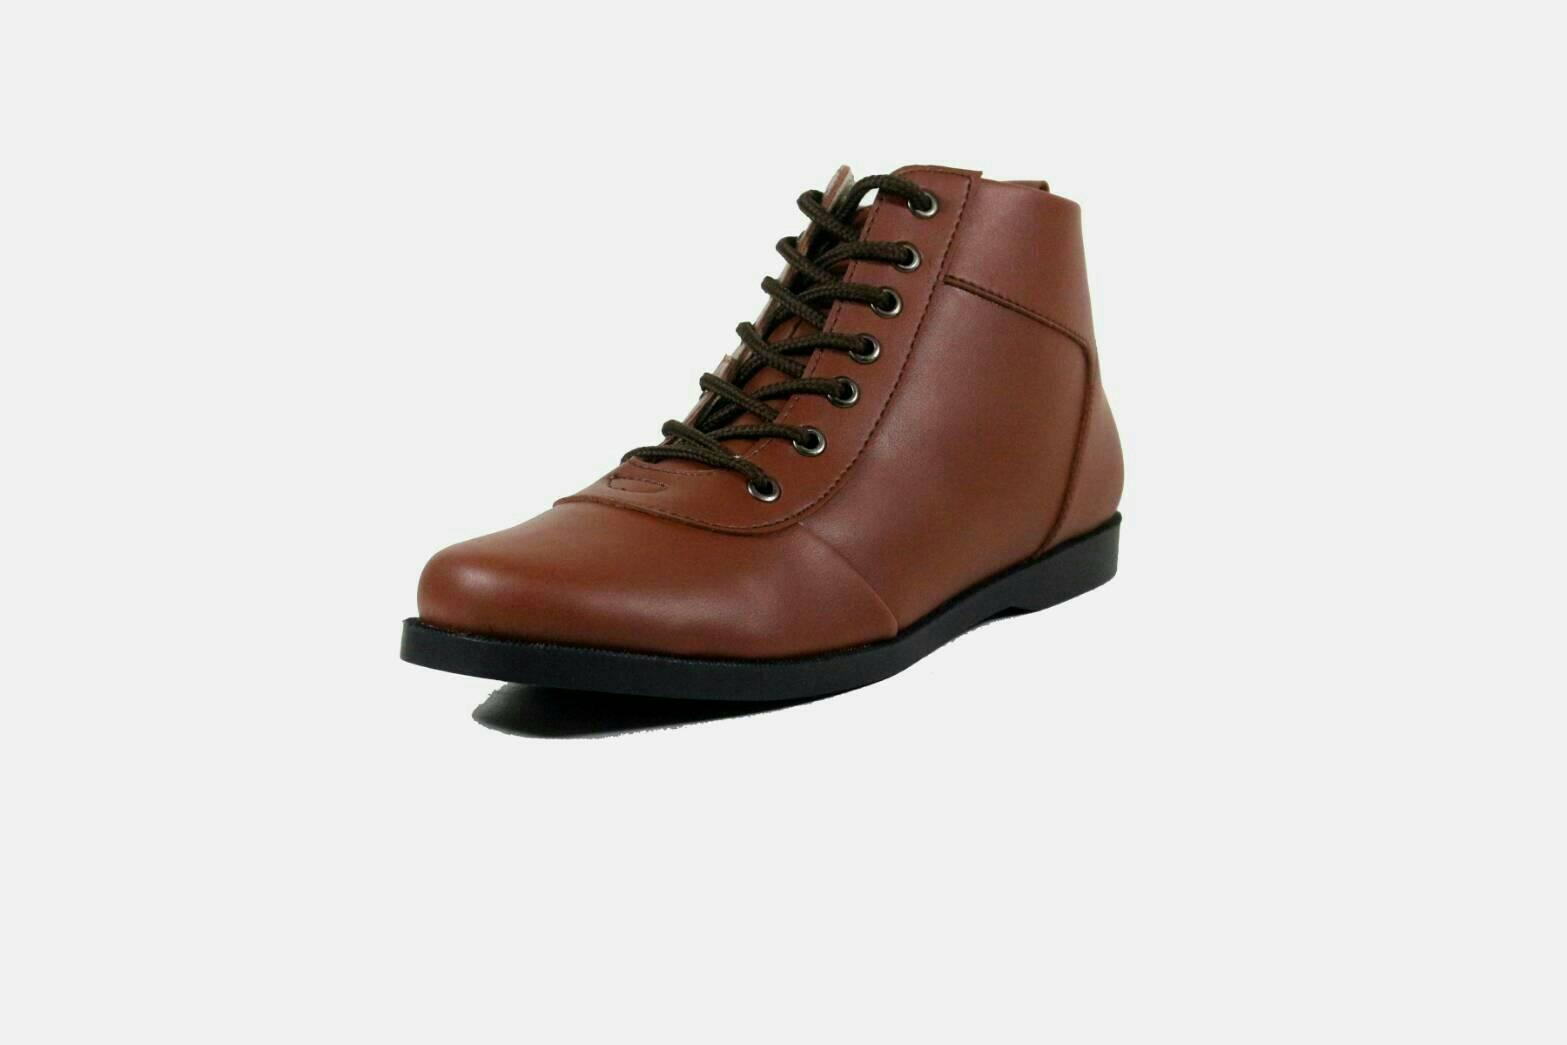 Sepatu pria semi boots avail Davidson black brodo